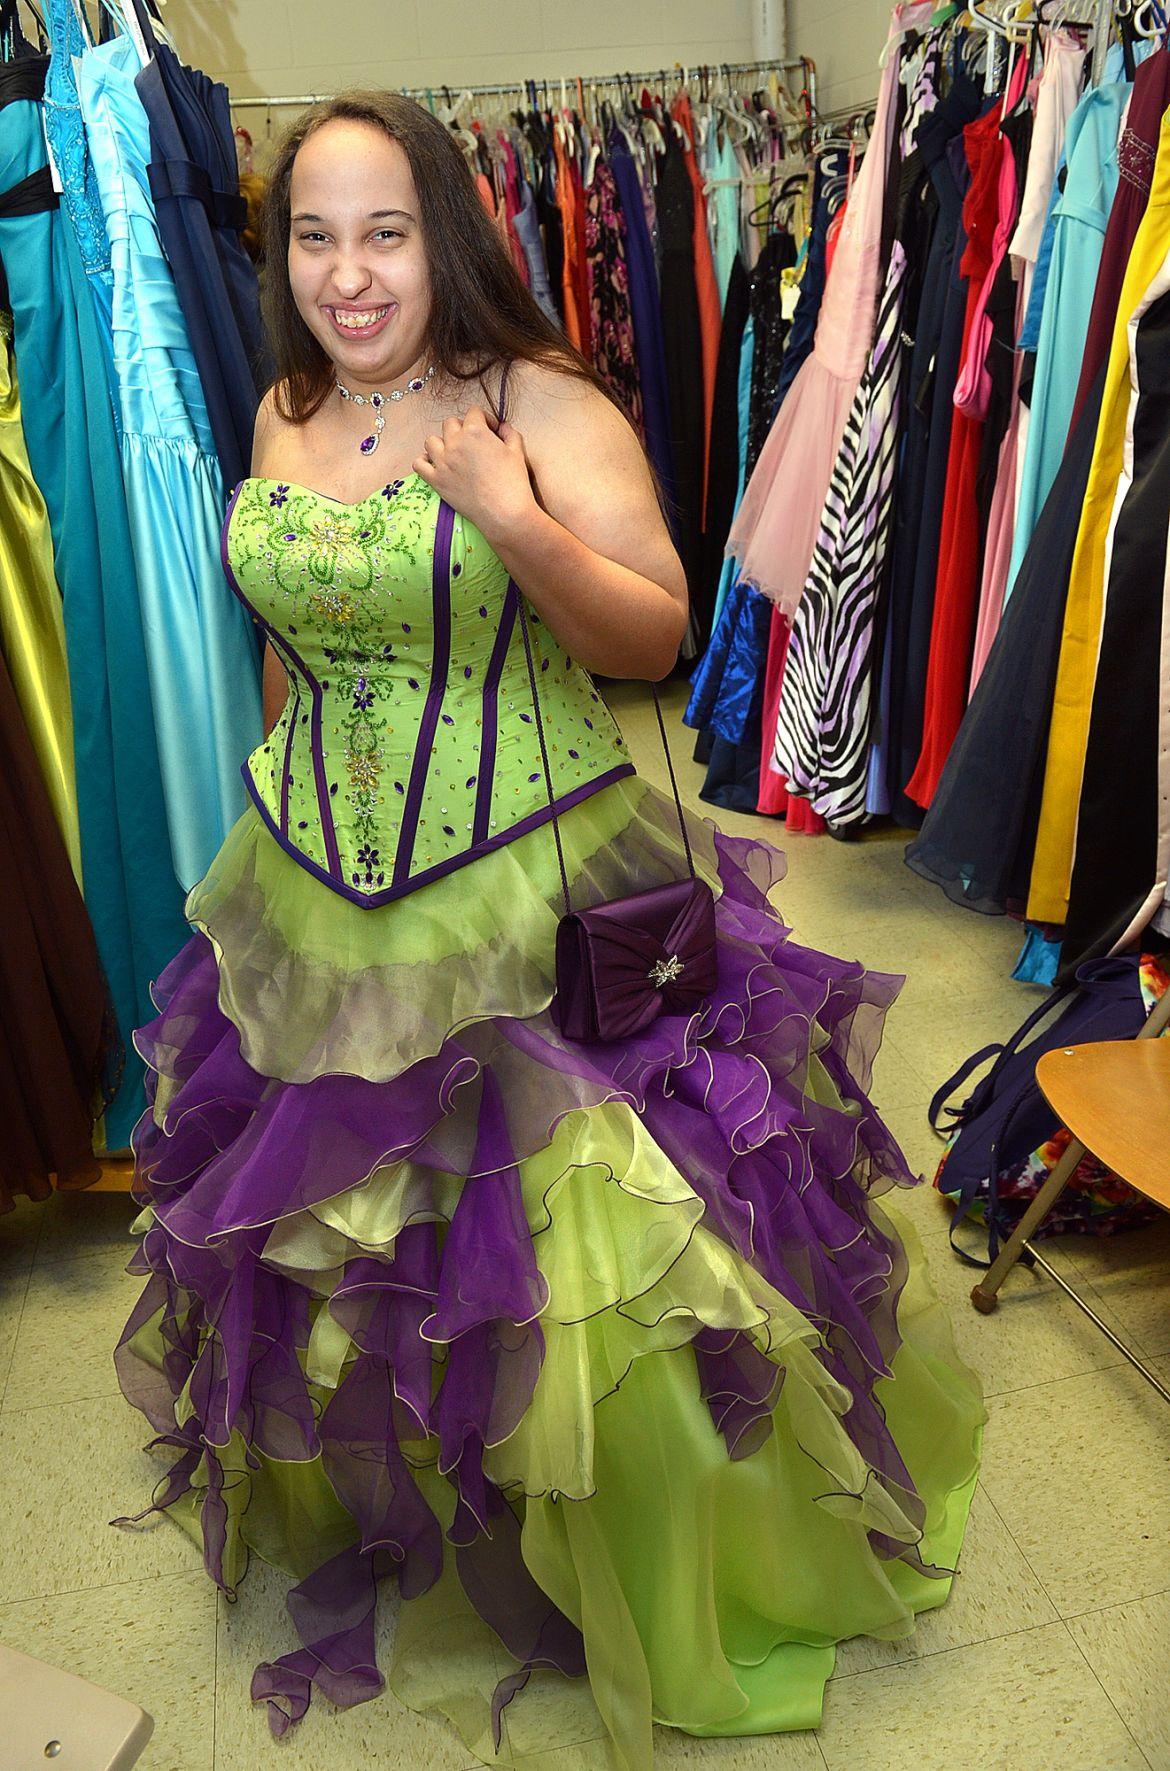 Ronda\'s Closet offers free prom dresses | News | wvgazettemail.com